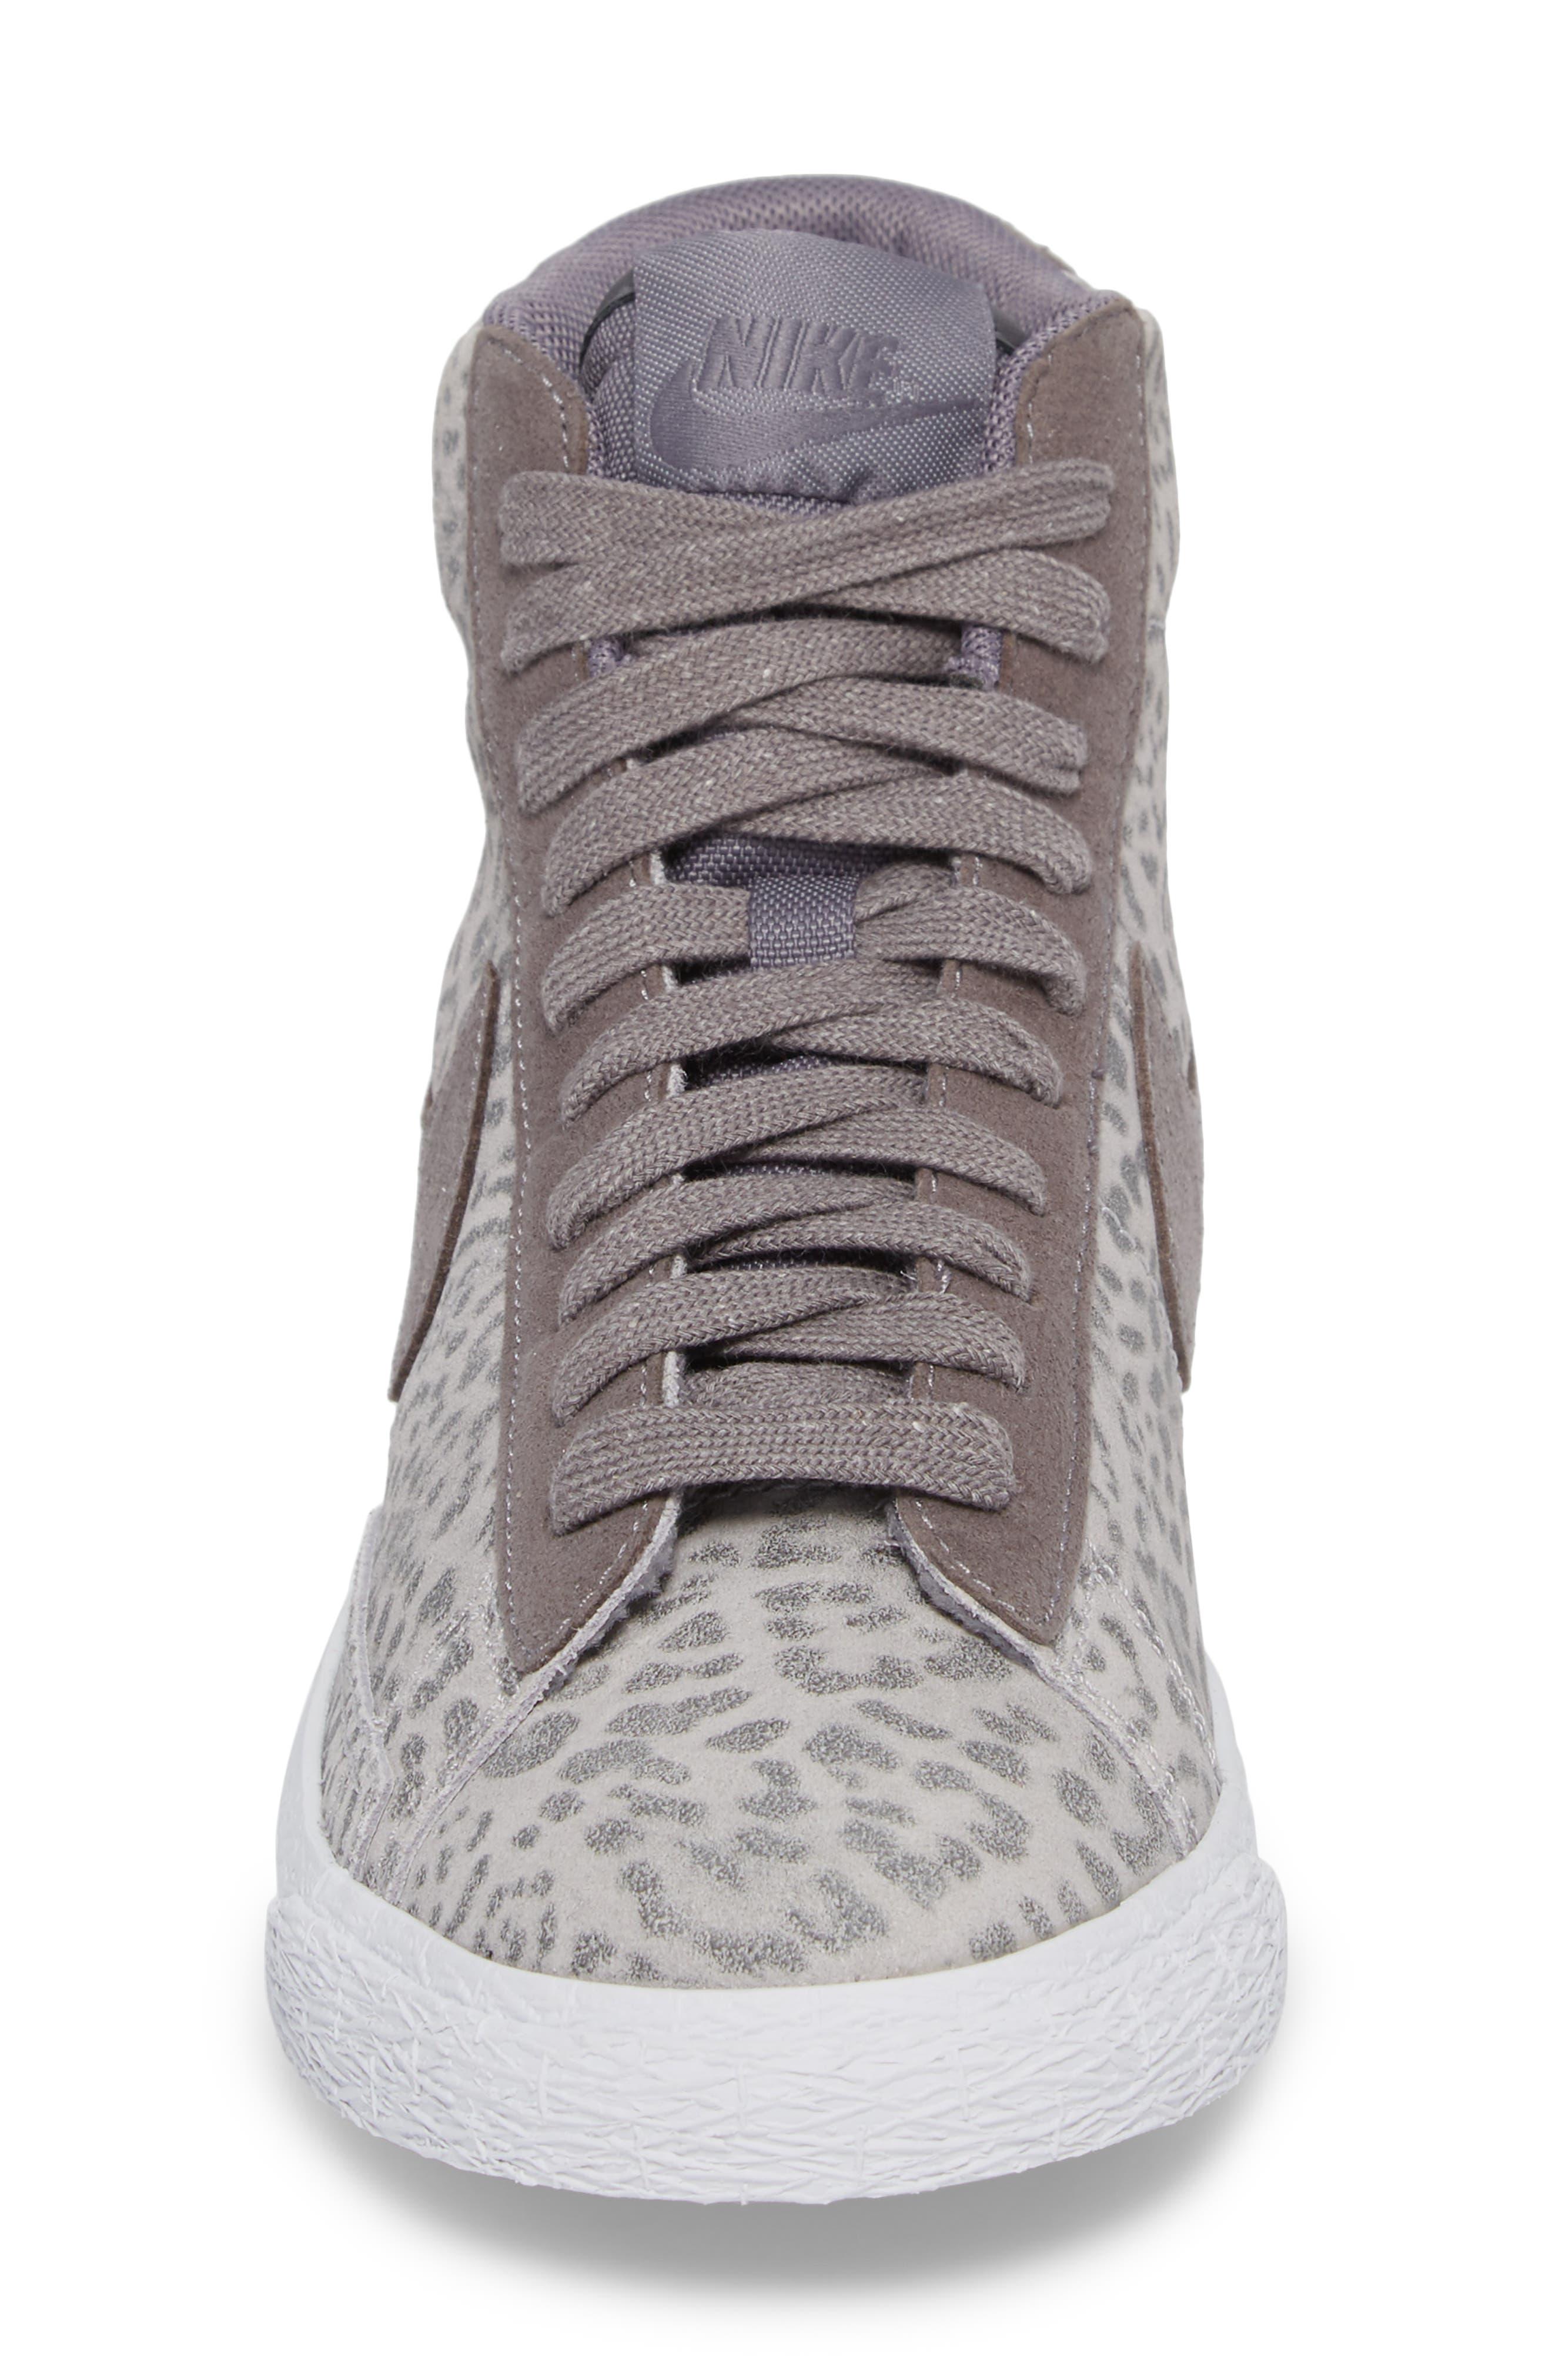 Blazer Mid SE High Top Sneaker,                             Alternate thumbnail 10, color,